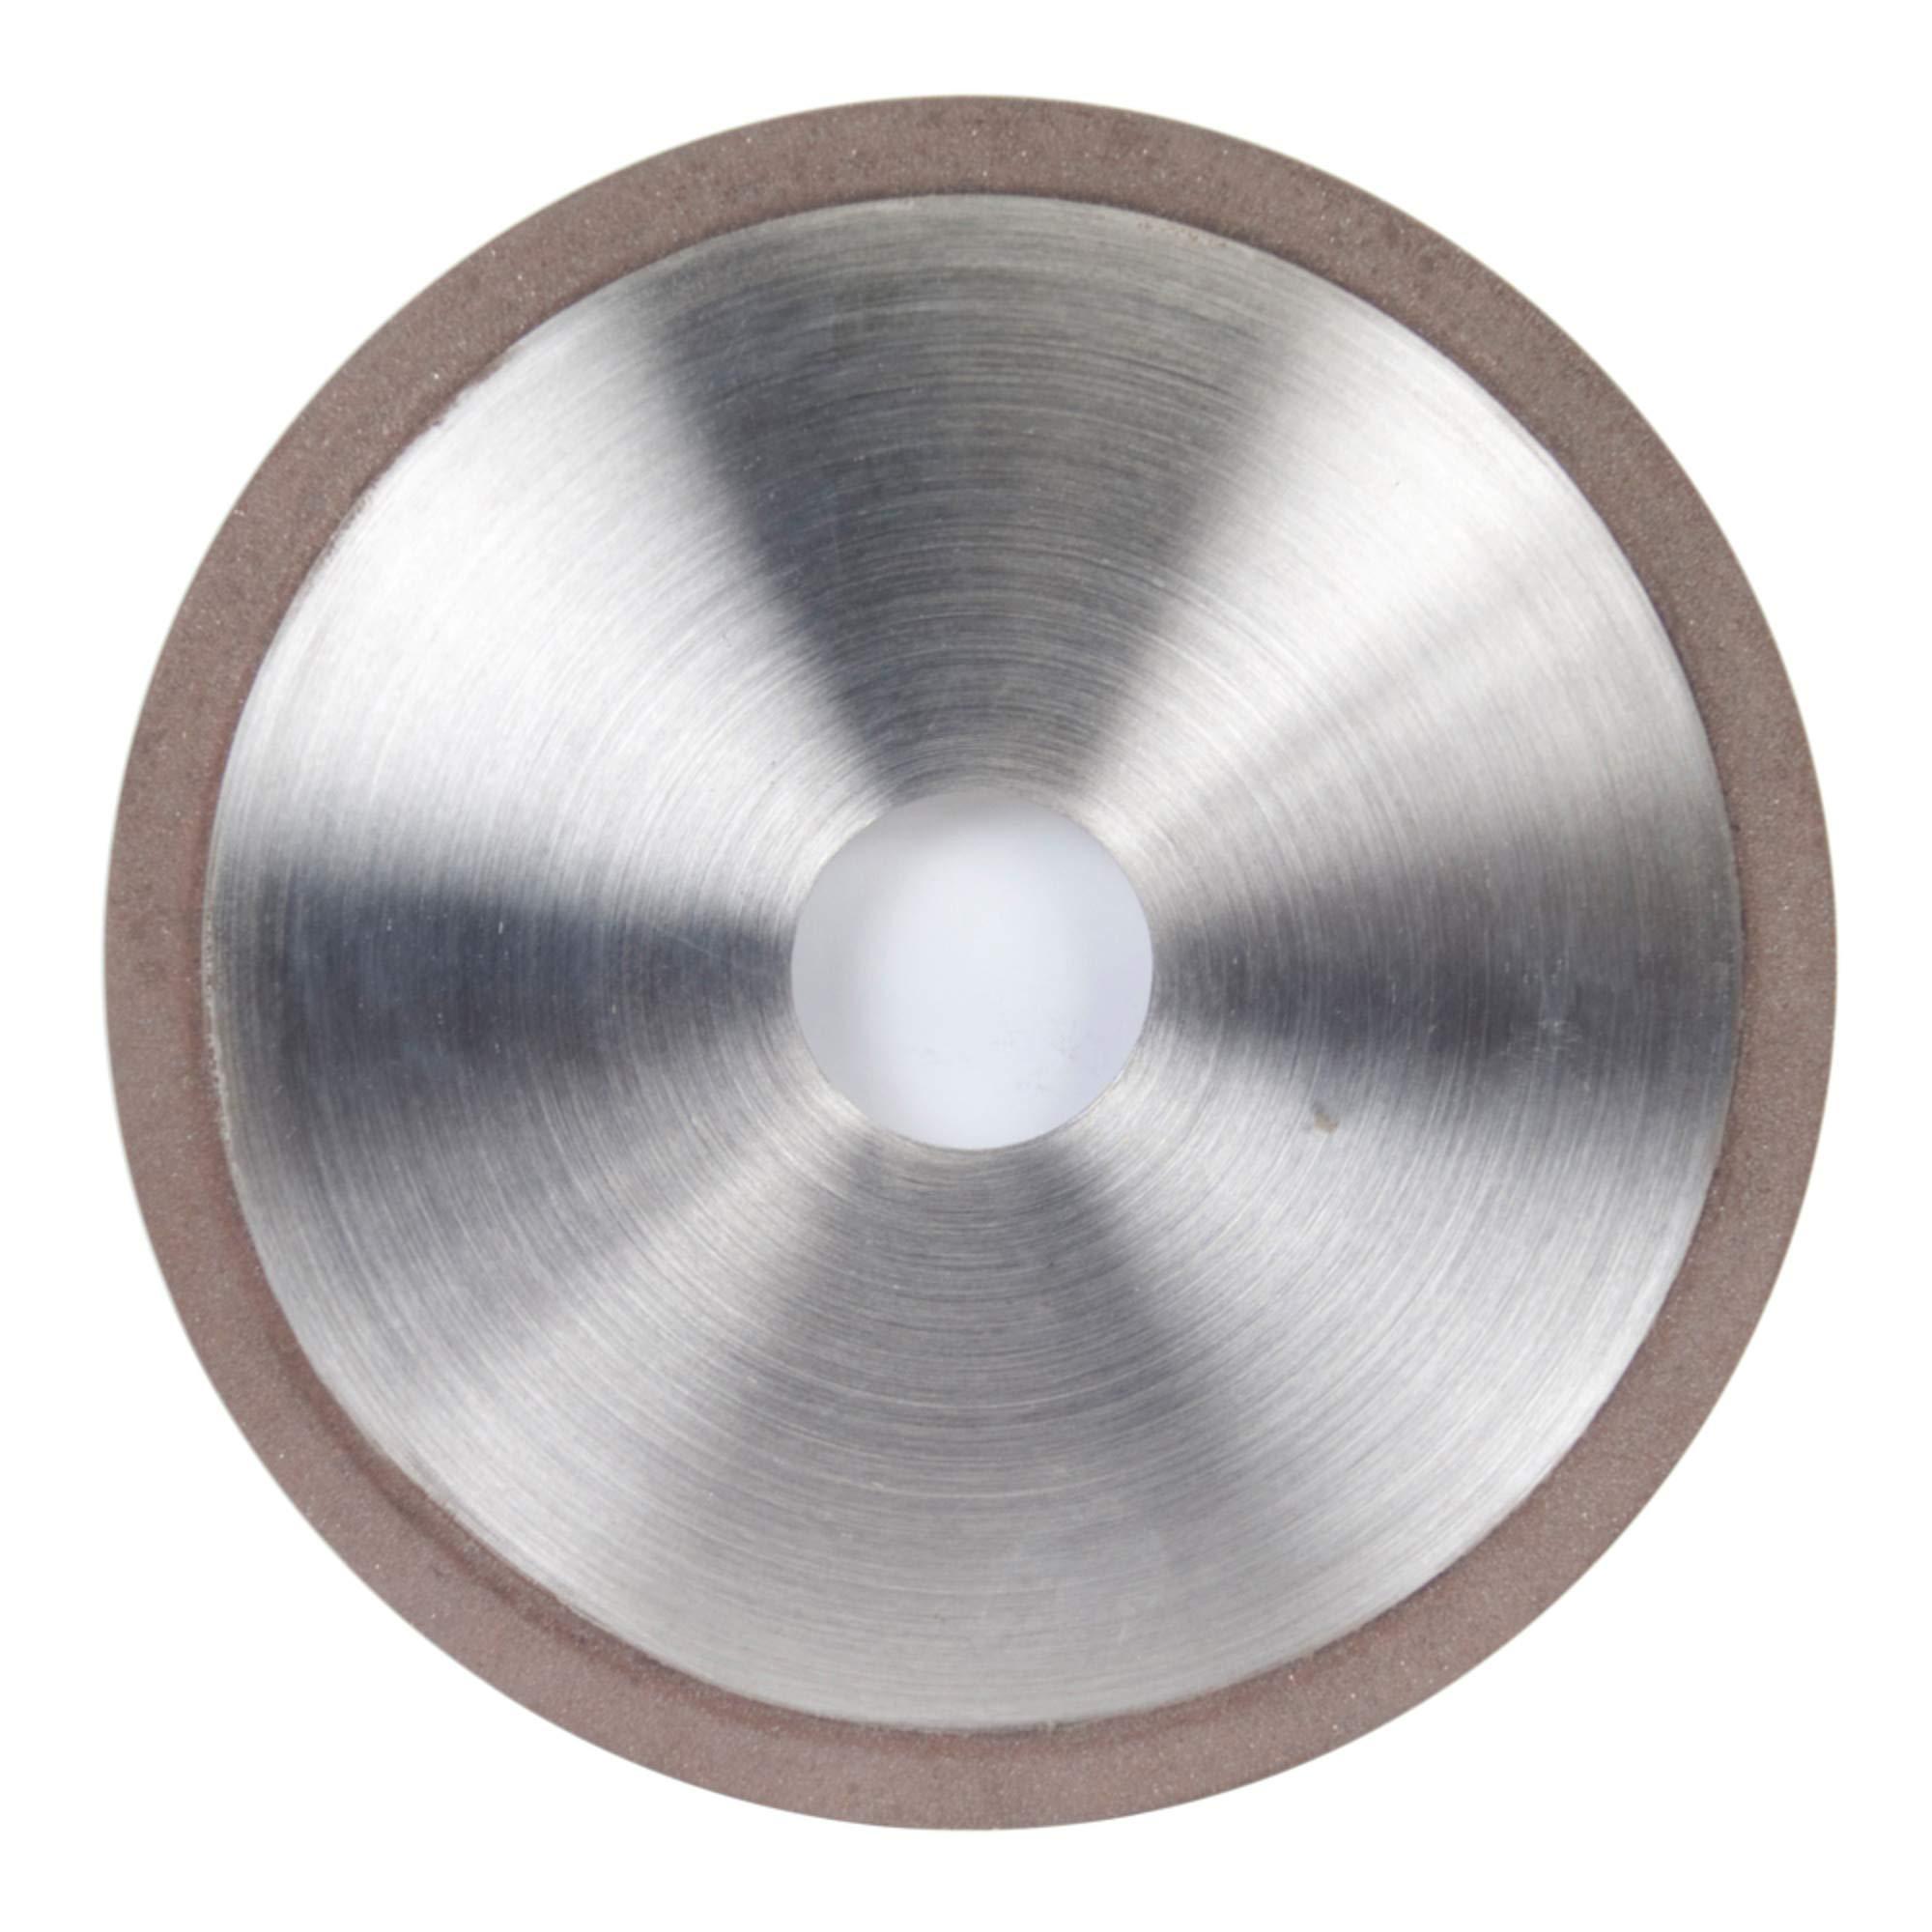 Norton Diamond Wheel 6'' Diameter 1/4'' Width 180 Grit Finishing Application D1A1 Diamond Wheel